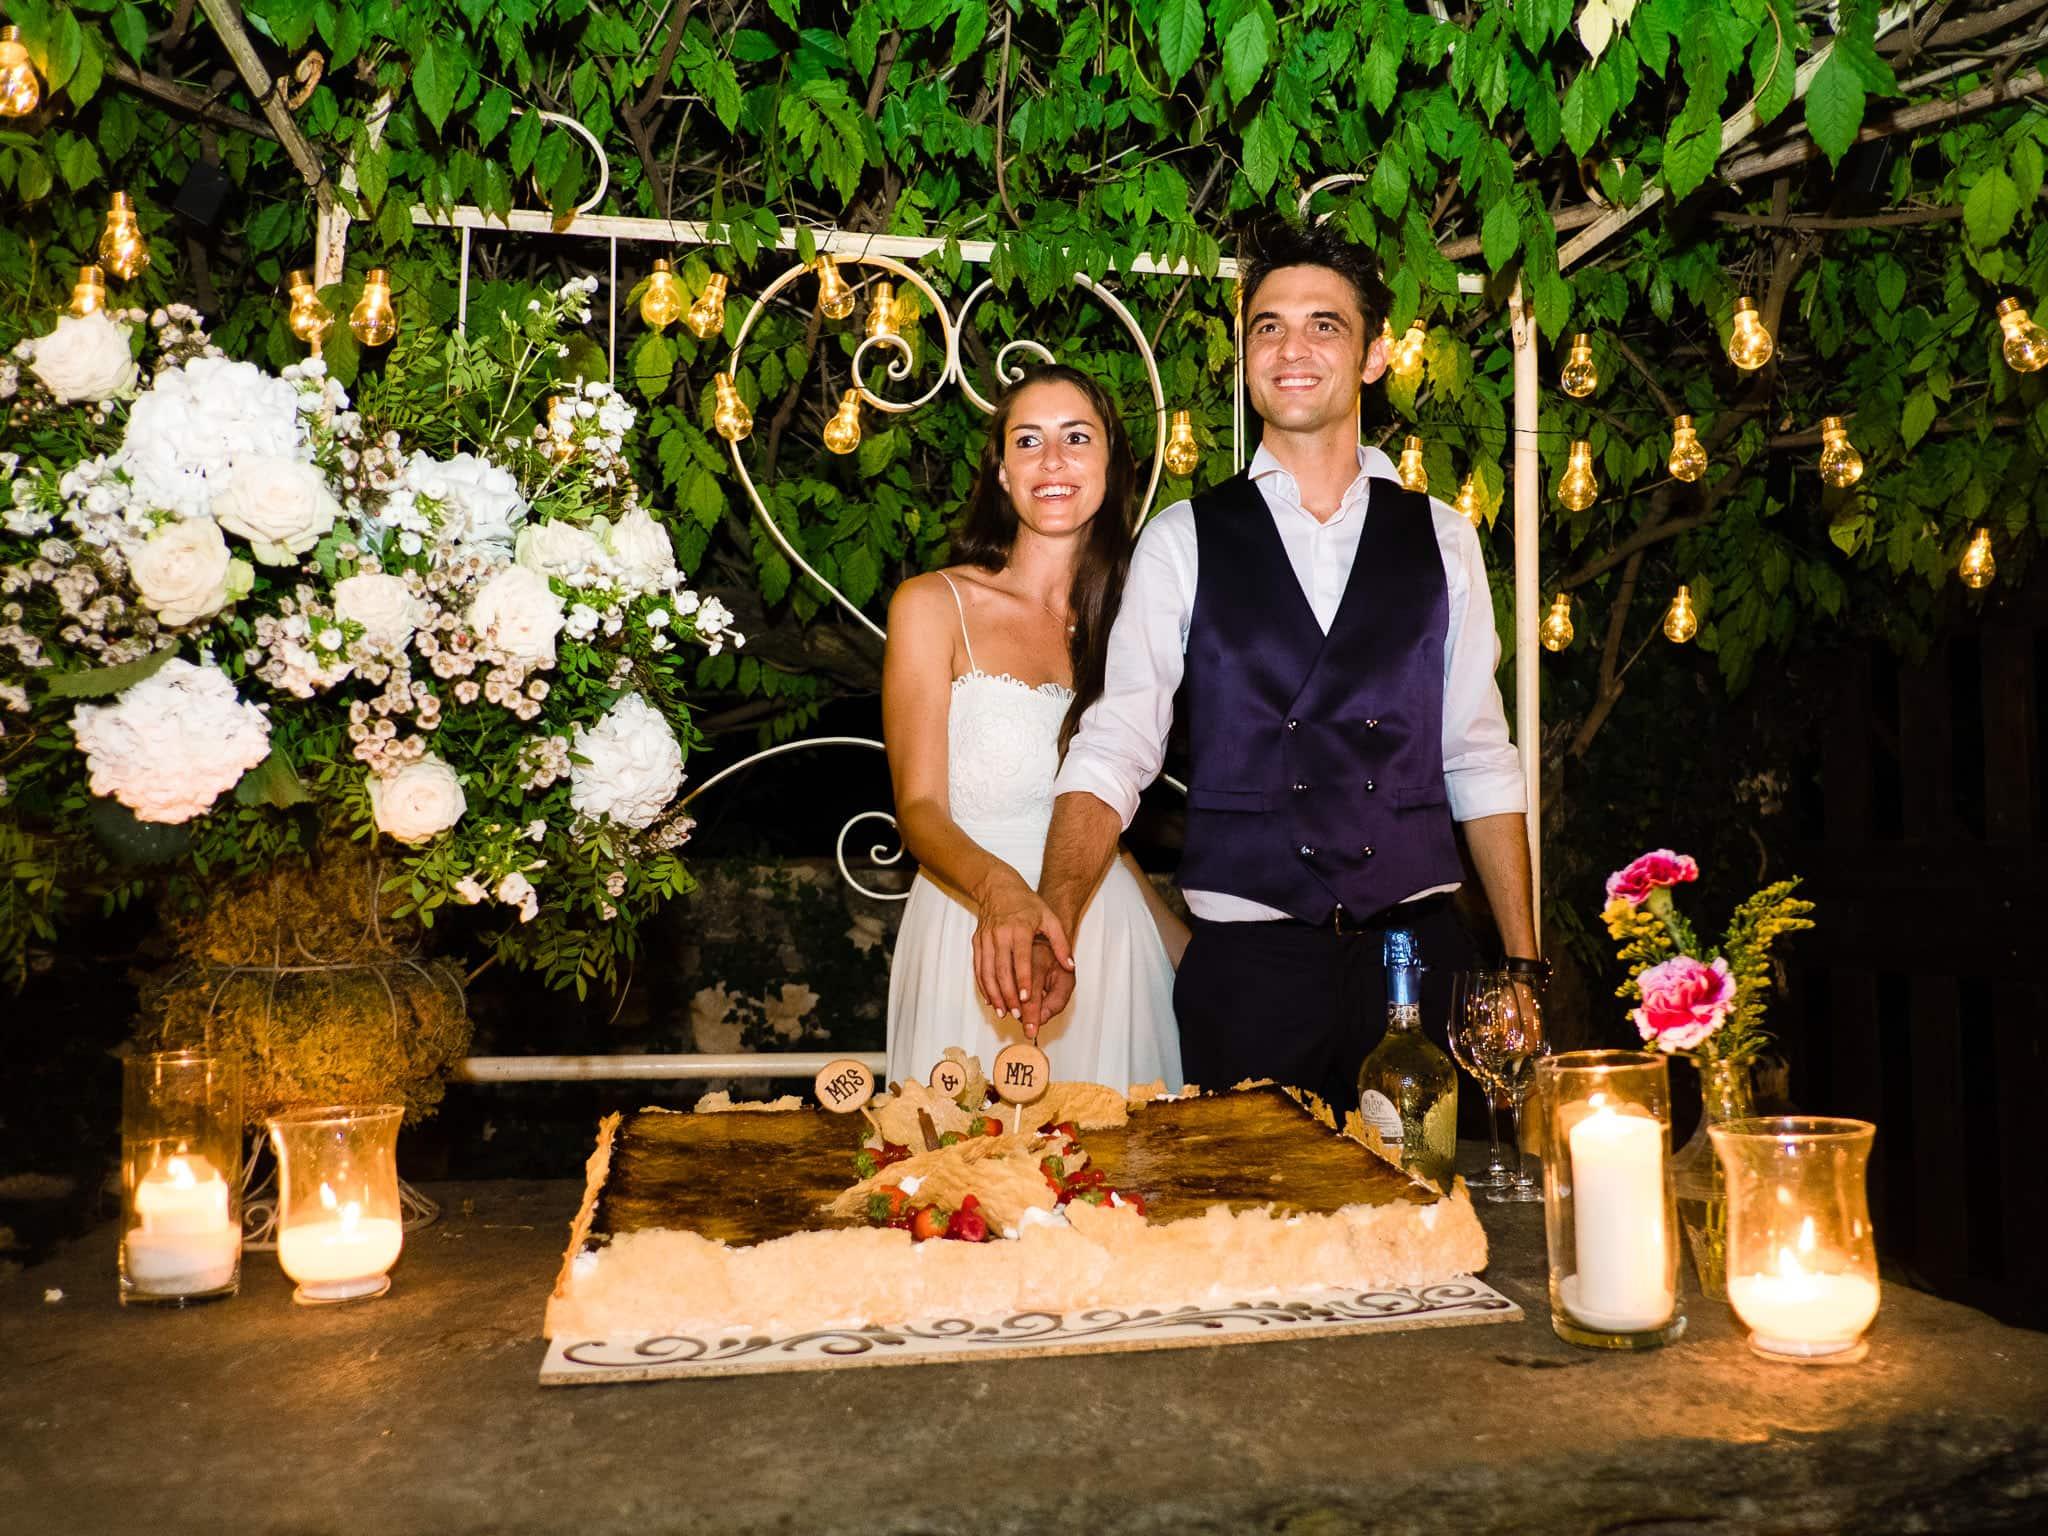 taglio torta reportage matrimonio mulino dell'olio varese